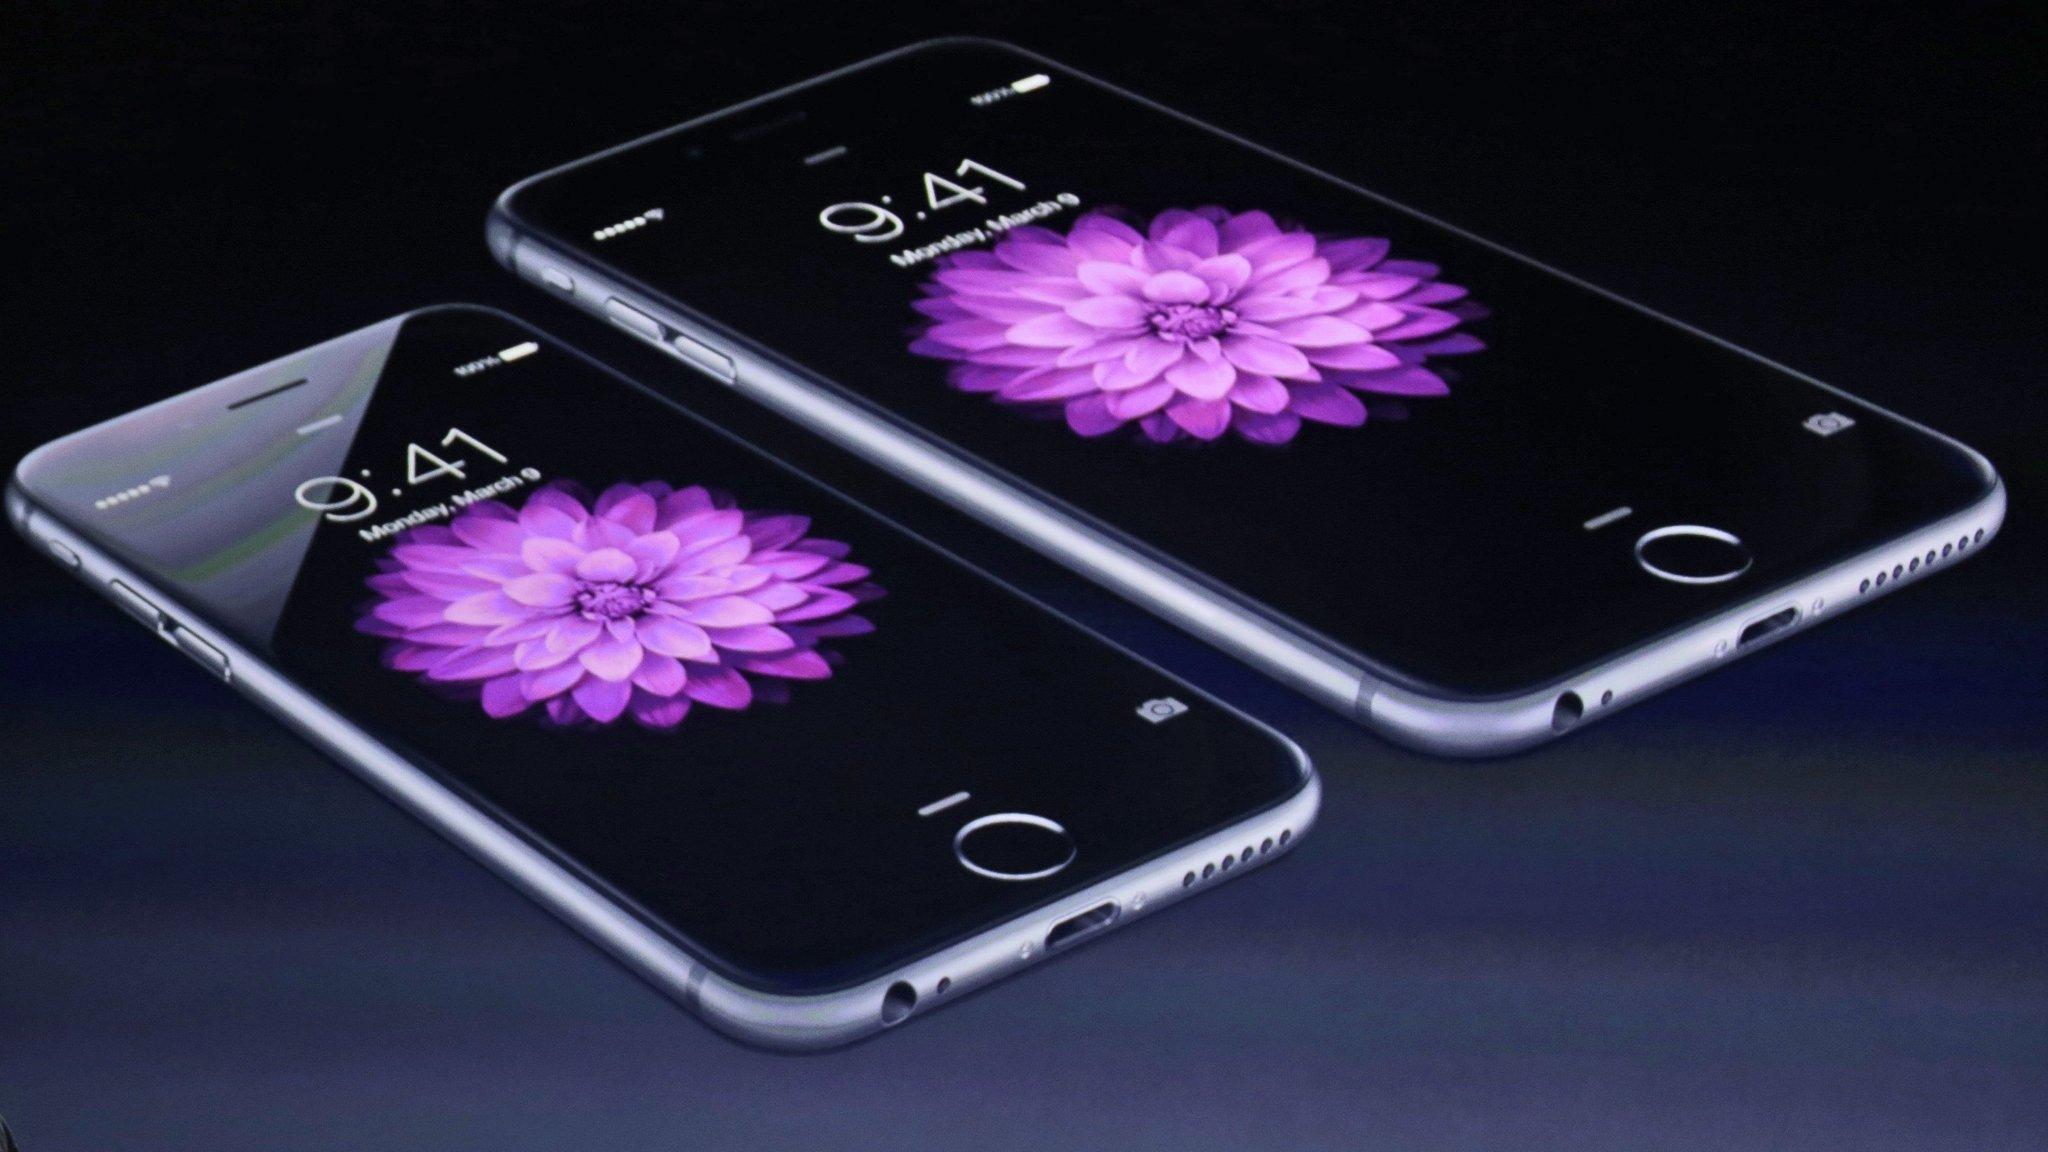 Apple iPhone slowdown tests consumer loyalty